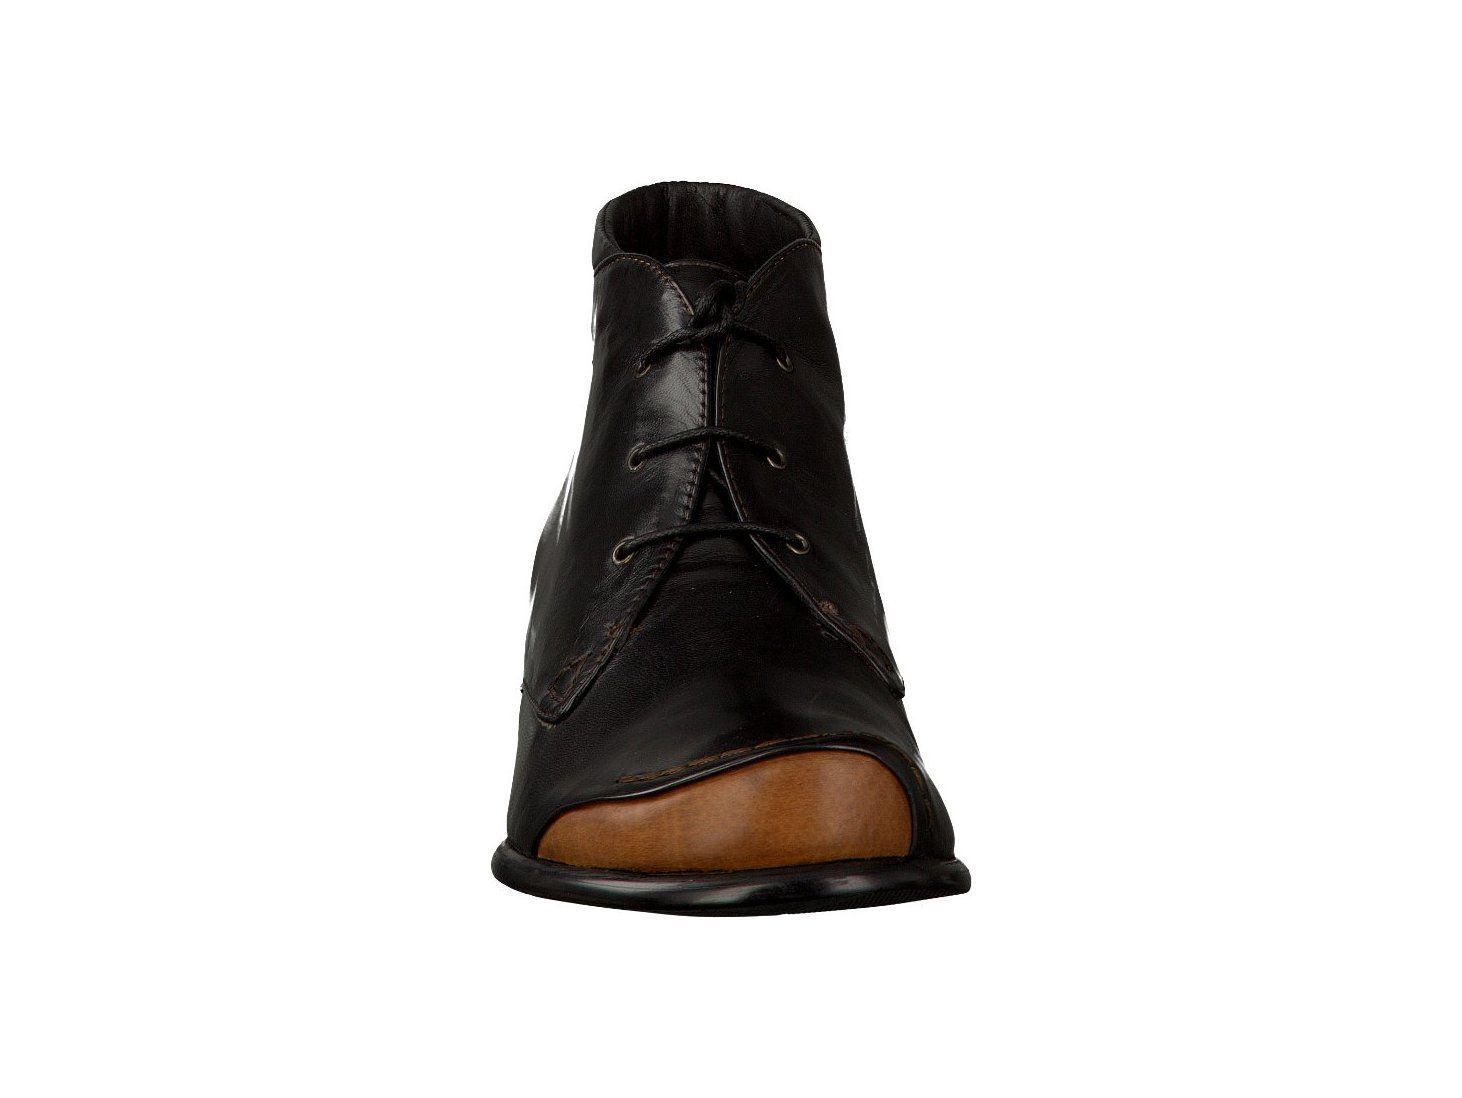 new product b52ff da1f8 everybody schuhe - Google-Suche | Schuhe ;-) | Everybody ...